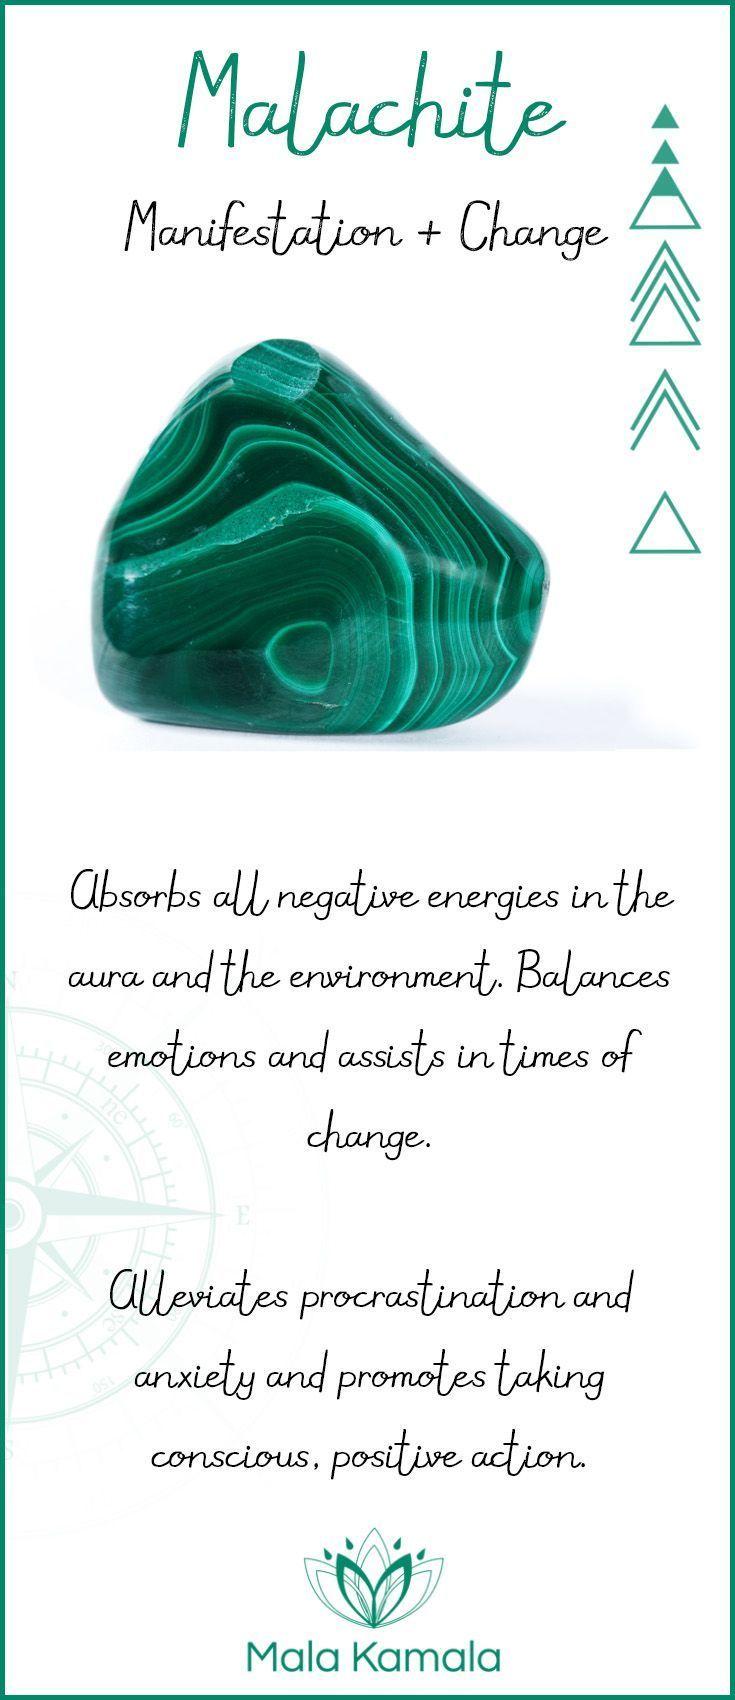 What Does Malachite Look Like : malachite, Meaning, Crystal, Chakra, Healing, Properties, Malachite?, Stone, Manifestation, Change., Cha…, Crystals, Gemstones,, Crystals,, Gemstones